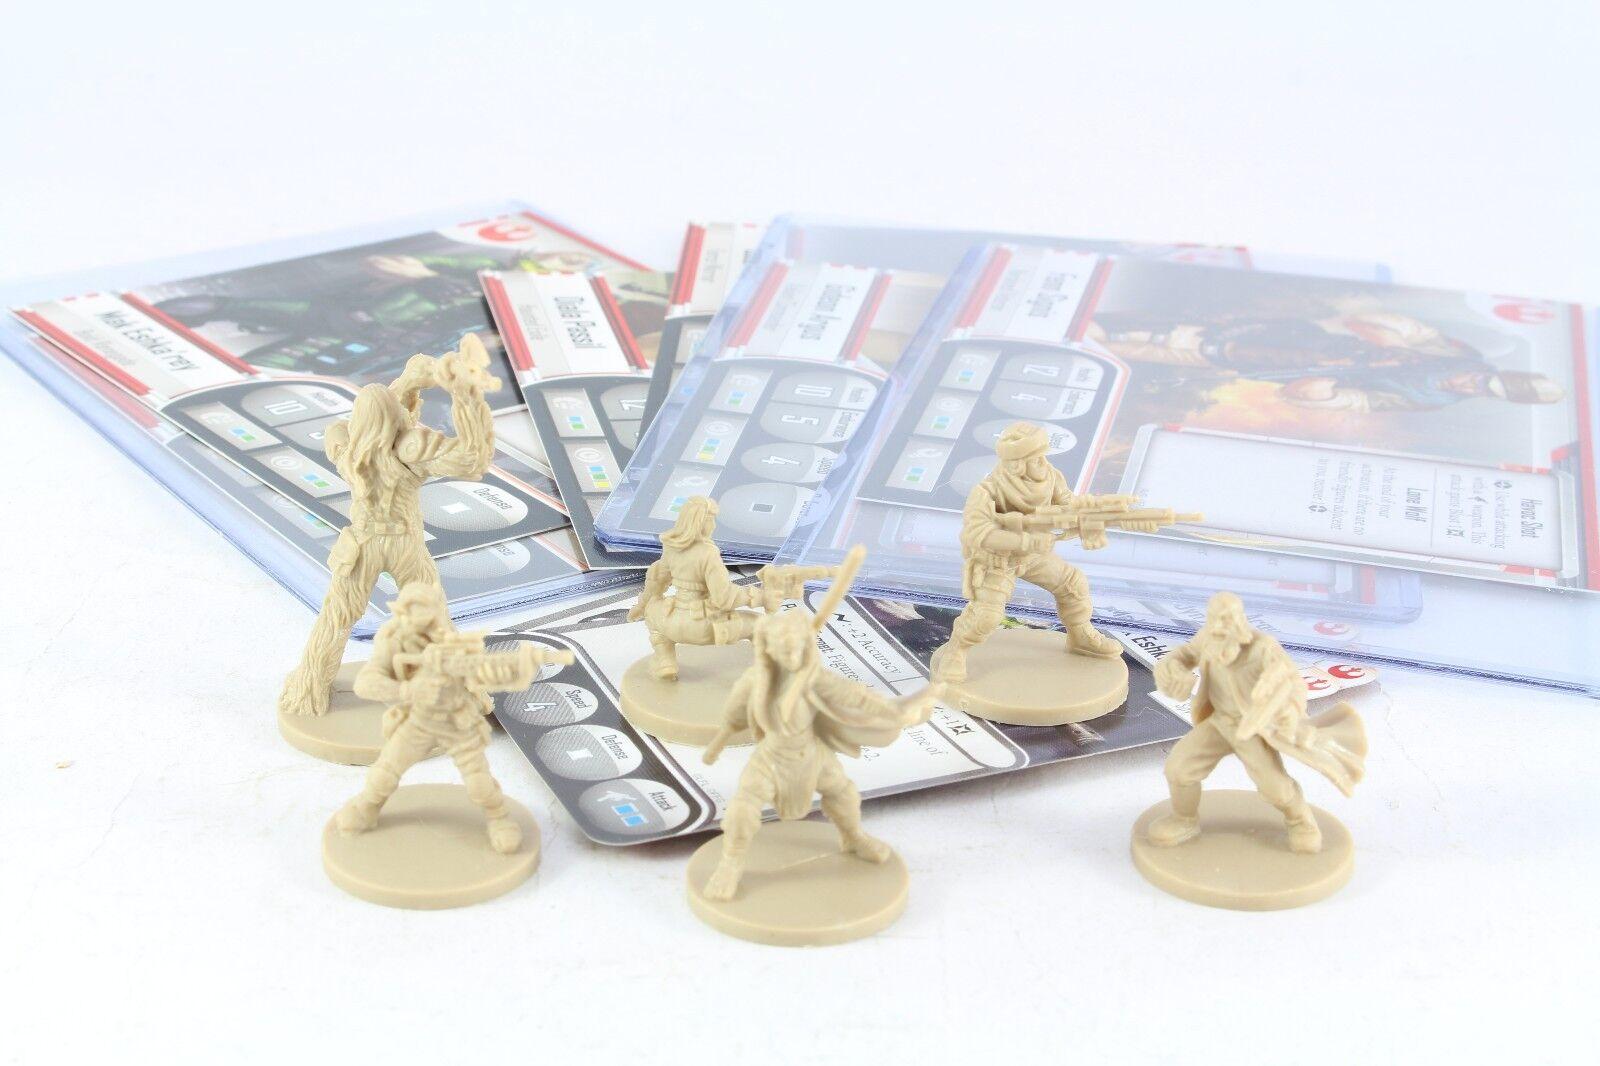 Star Wars Miniatures Hero x 6 Imperial Assault Group Diala Passil Gaarkhan